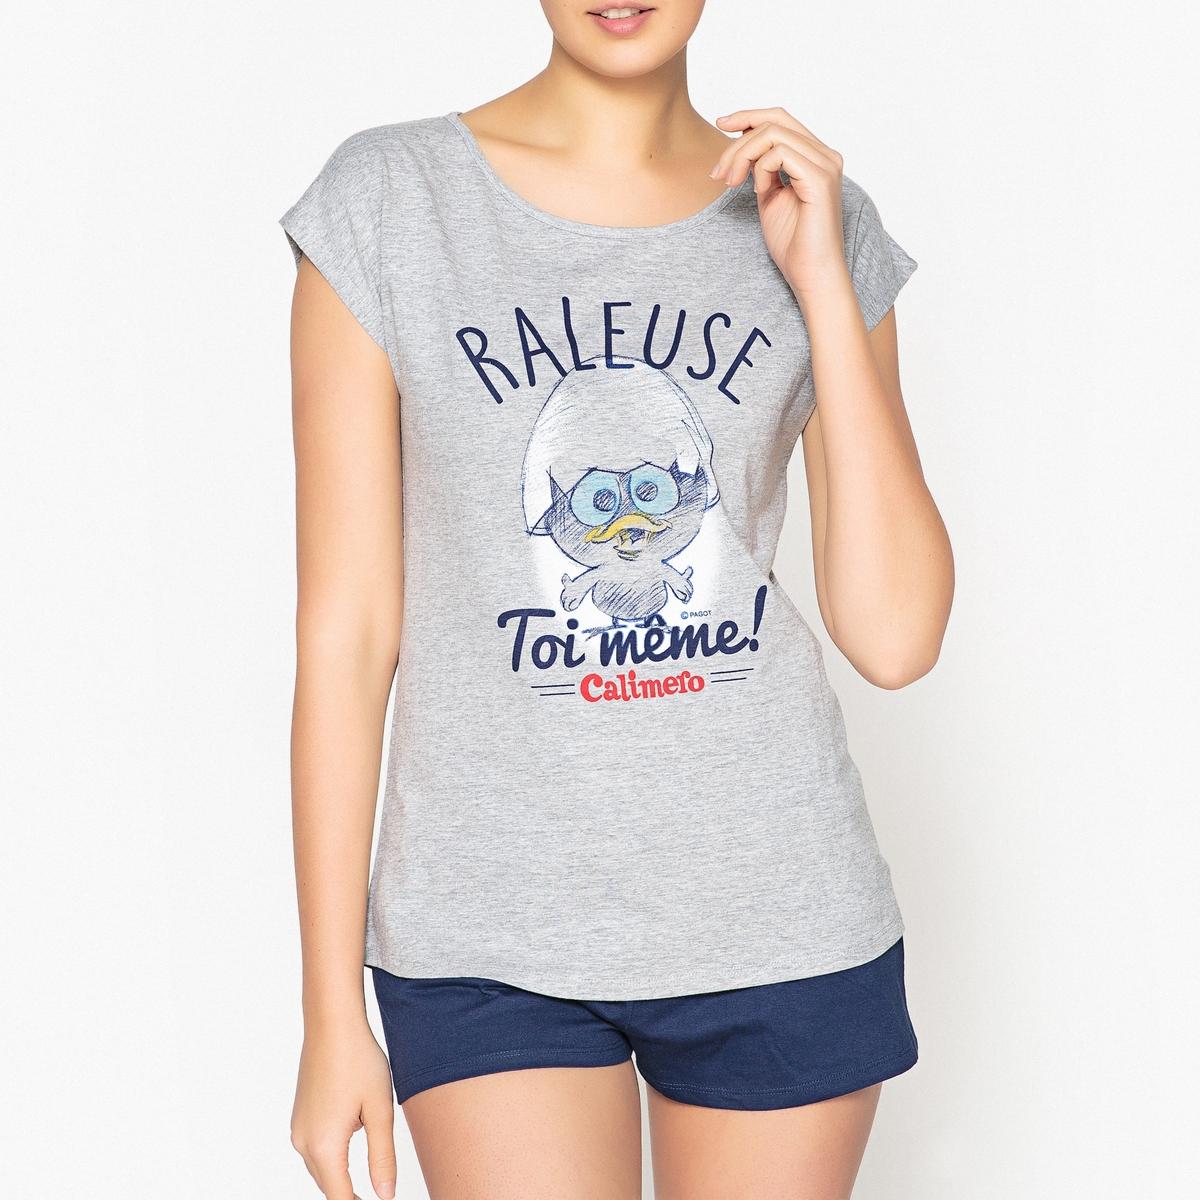 Пижама из хлопка с рисунком, с шортами, Calimero пижама с шортами с рисунком 2 12 лет